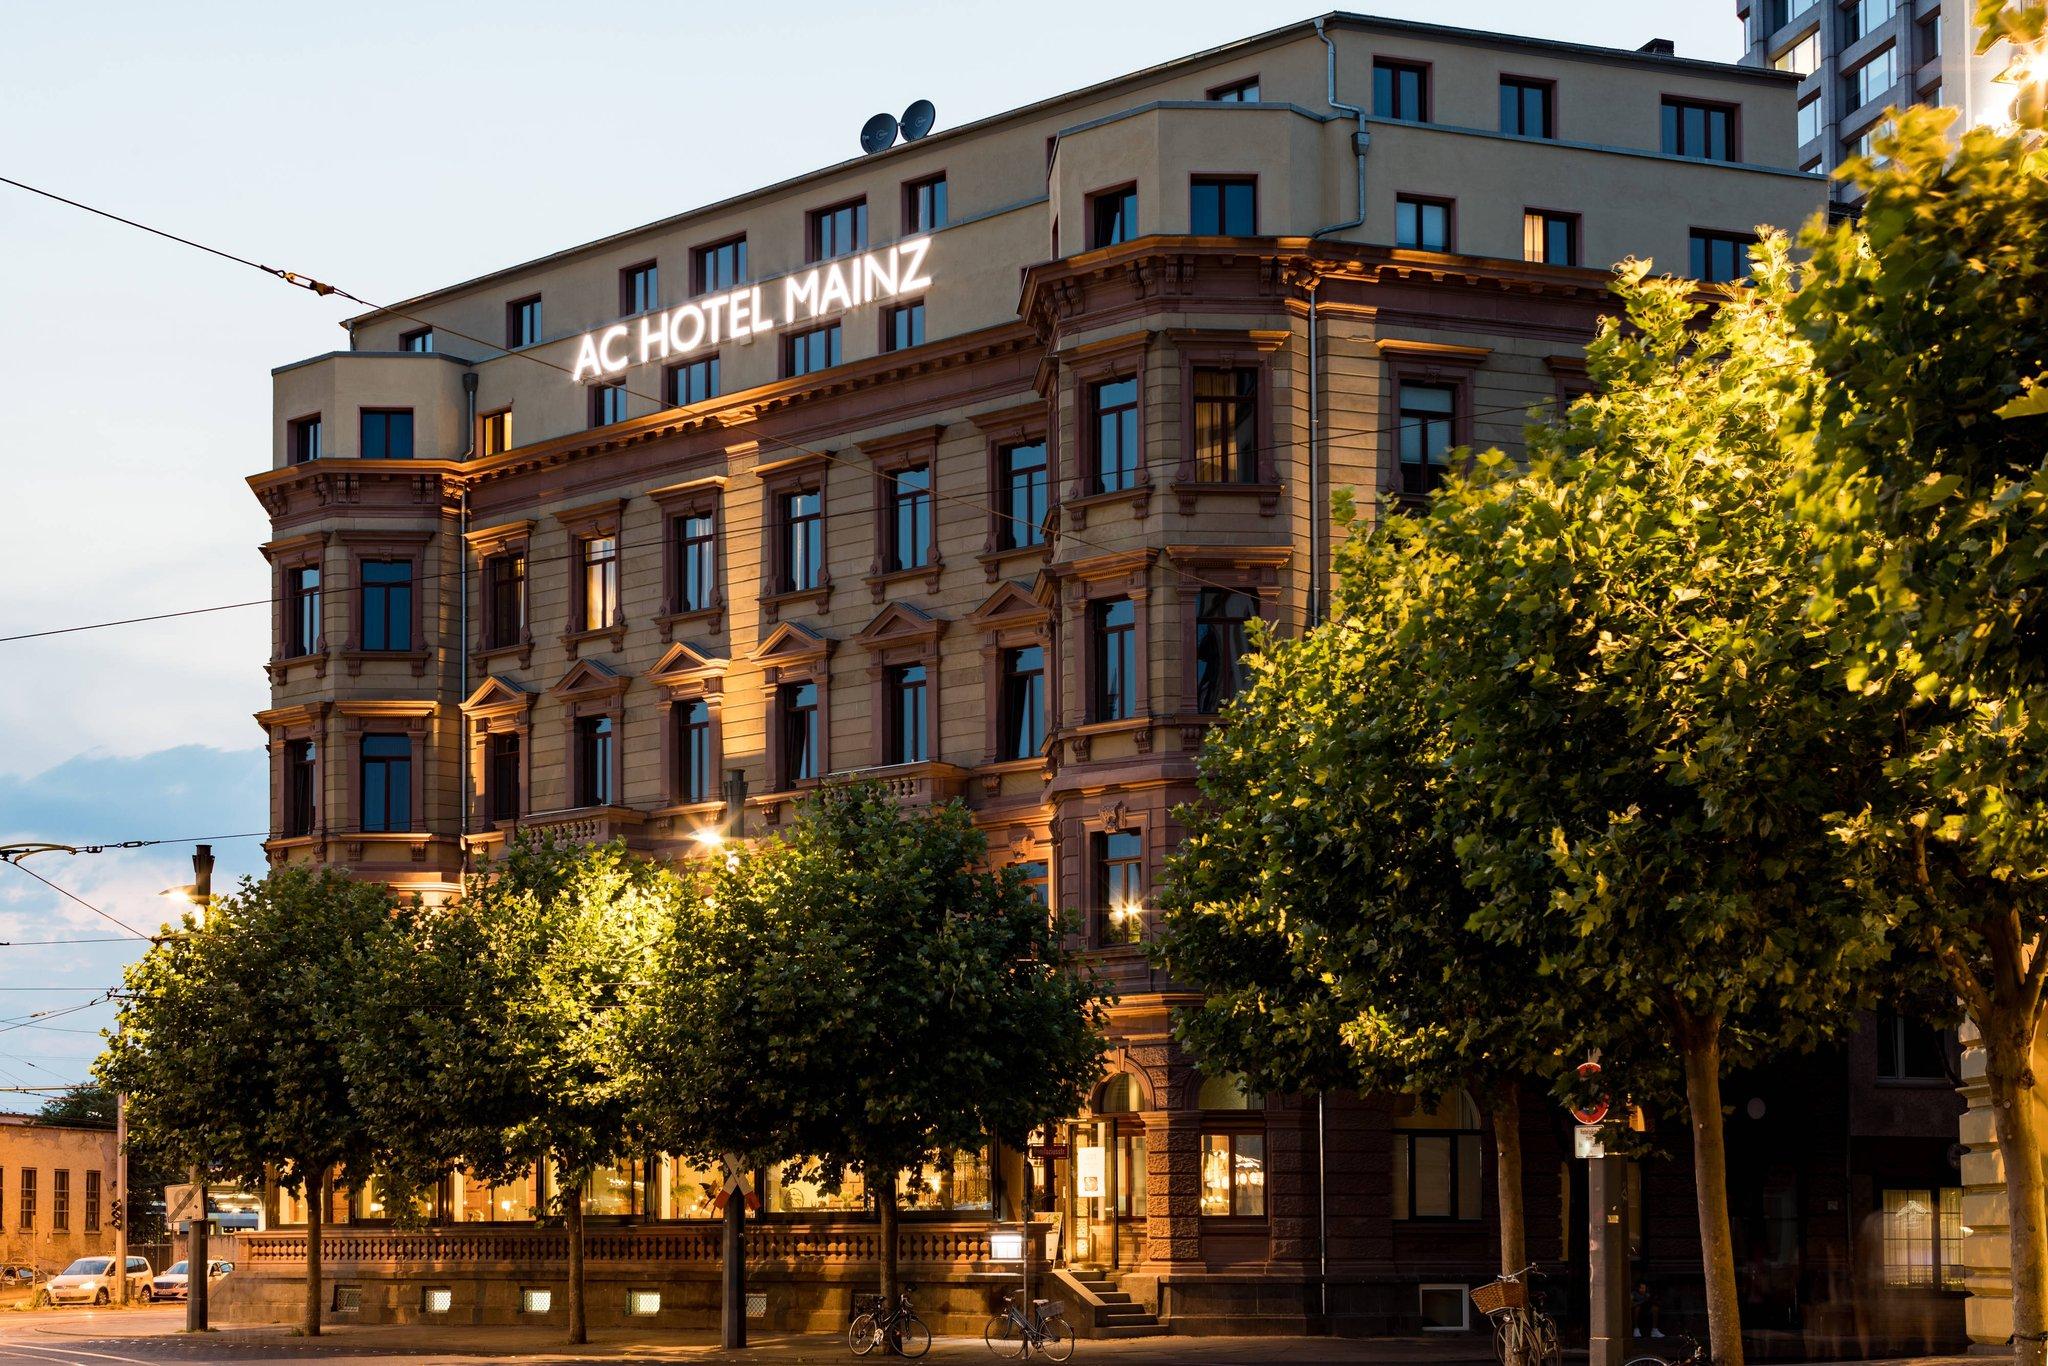 AC Hotel Mainz